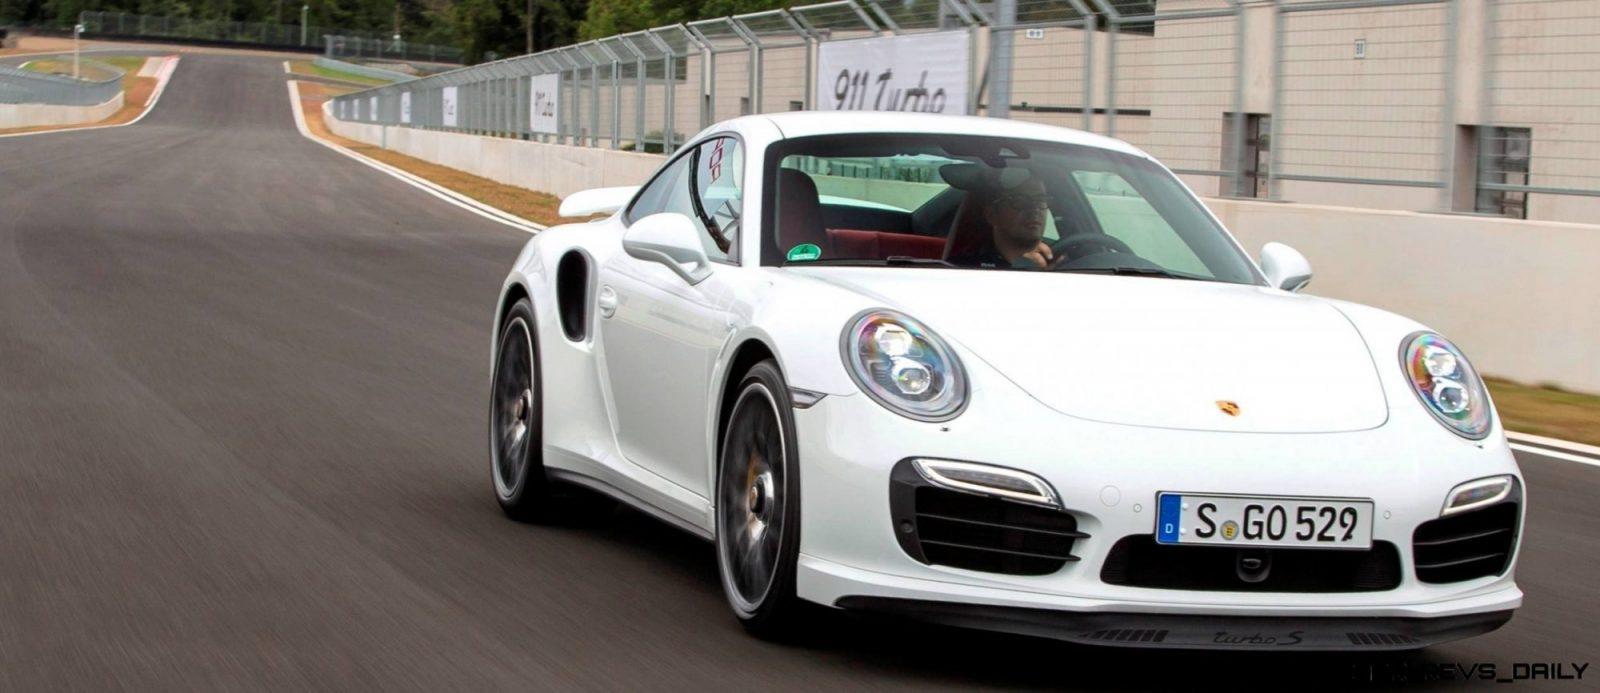 Porsche 911 Turbo S _39_